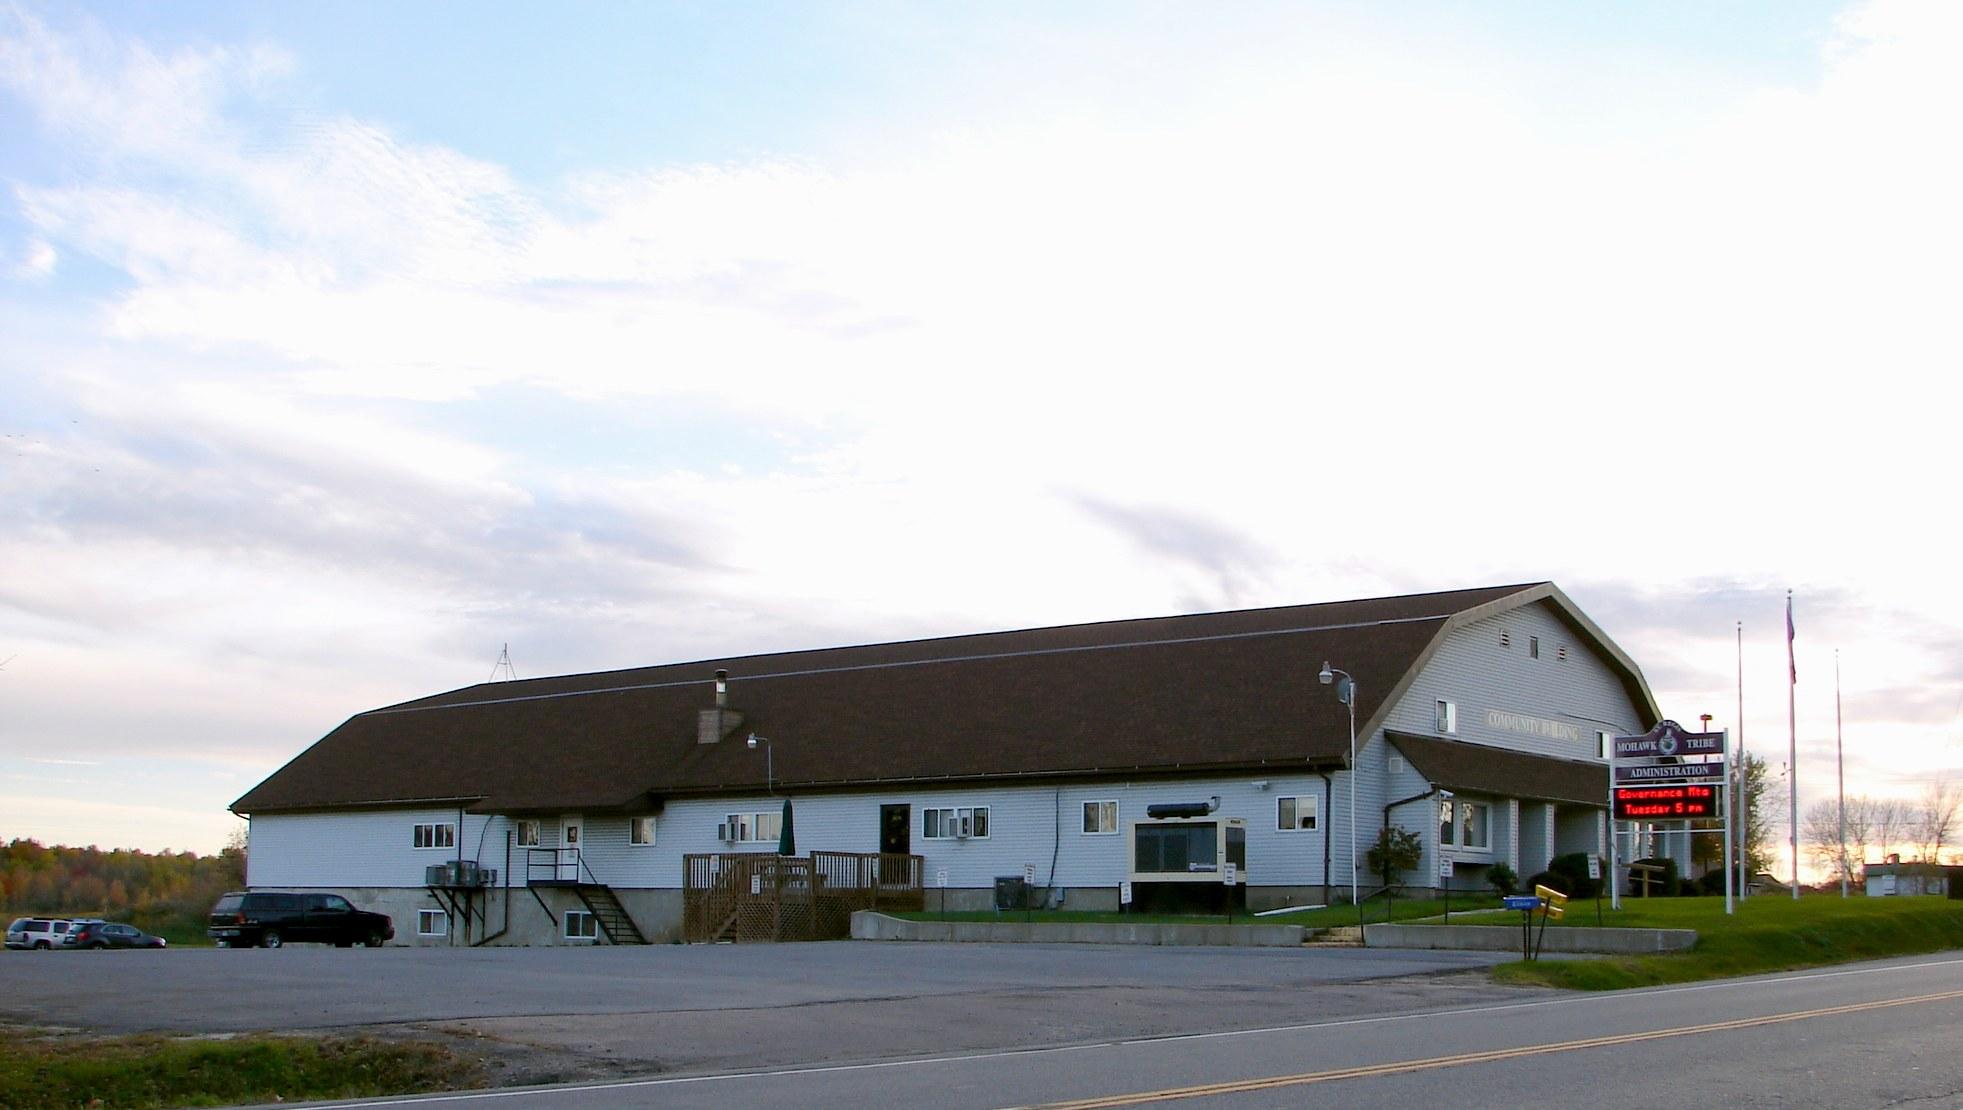 St  Regis Mohawk Reservation - Wikipedia